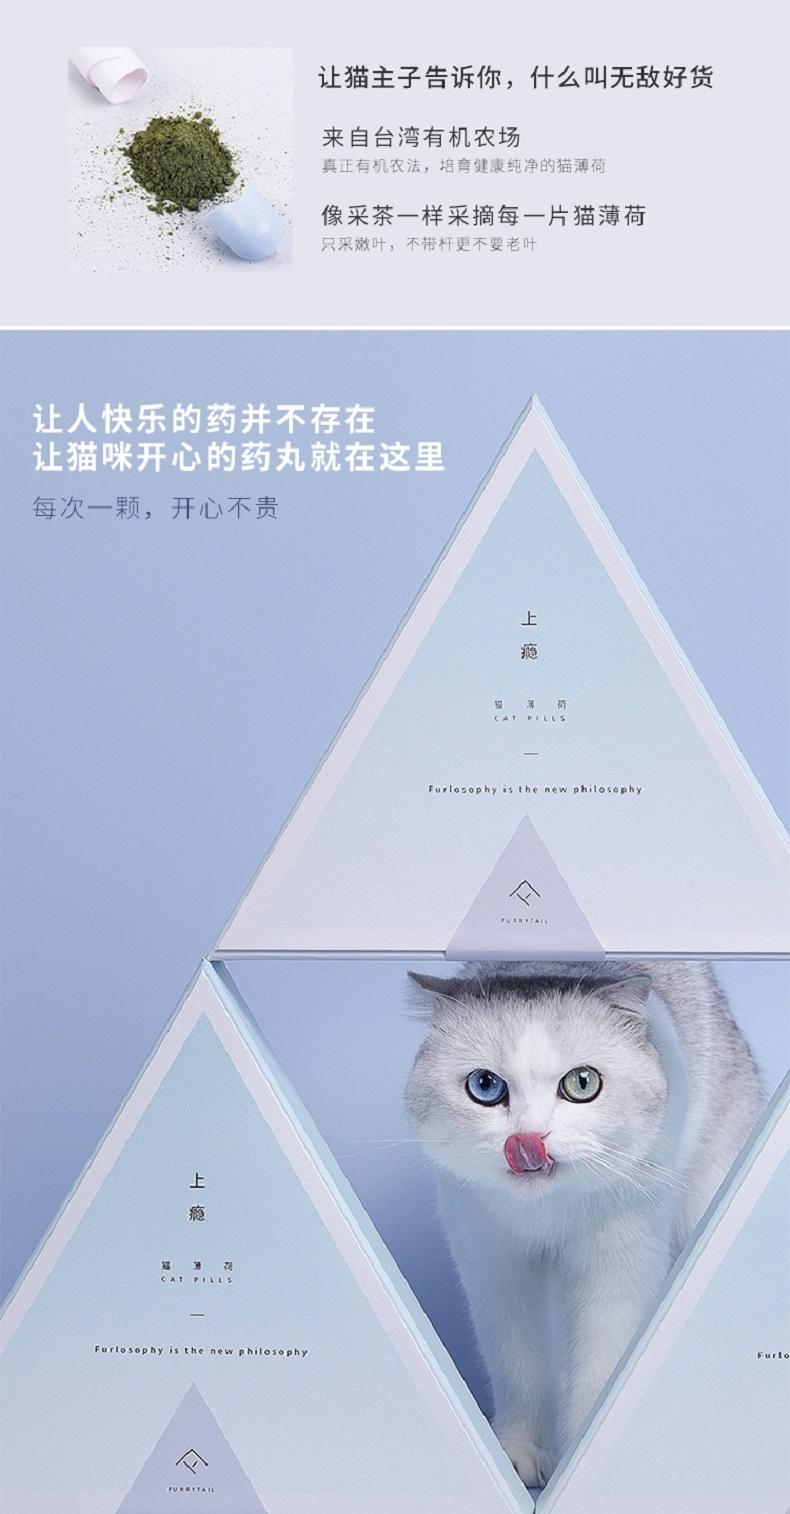 FURRYTAIL 柔软细腻上瘾猫薄荷 800g 独立胶囊包装